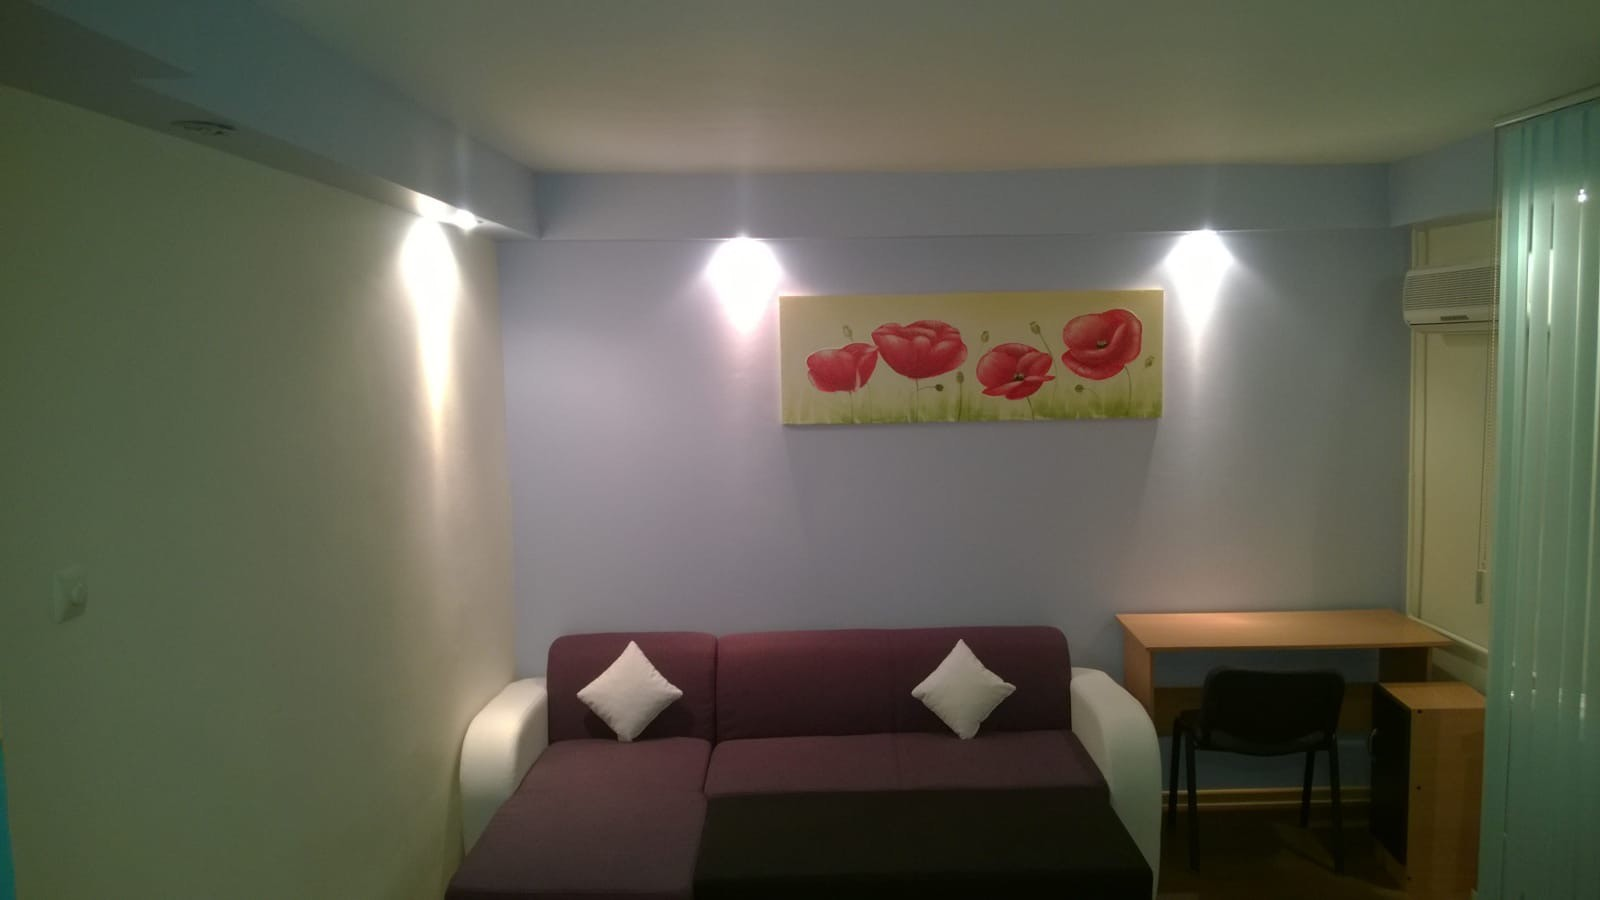 rent-2-bedroom-apartmentcentral-iasi-5-min-walking-mall-607b52c8e24a219b9bbebf02c5ebad8a